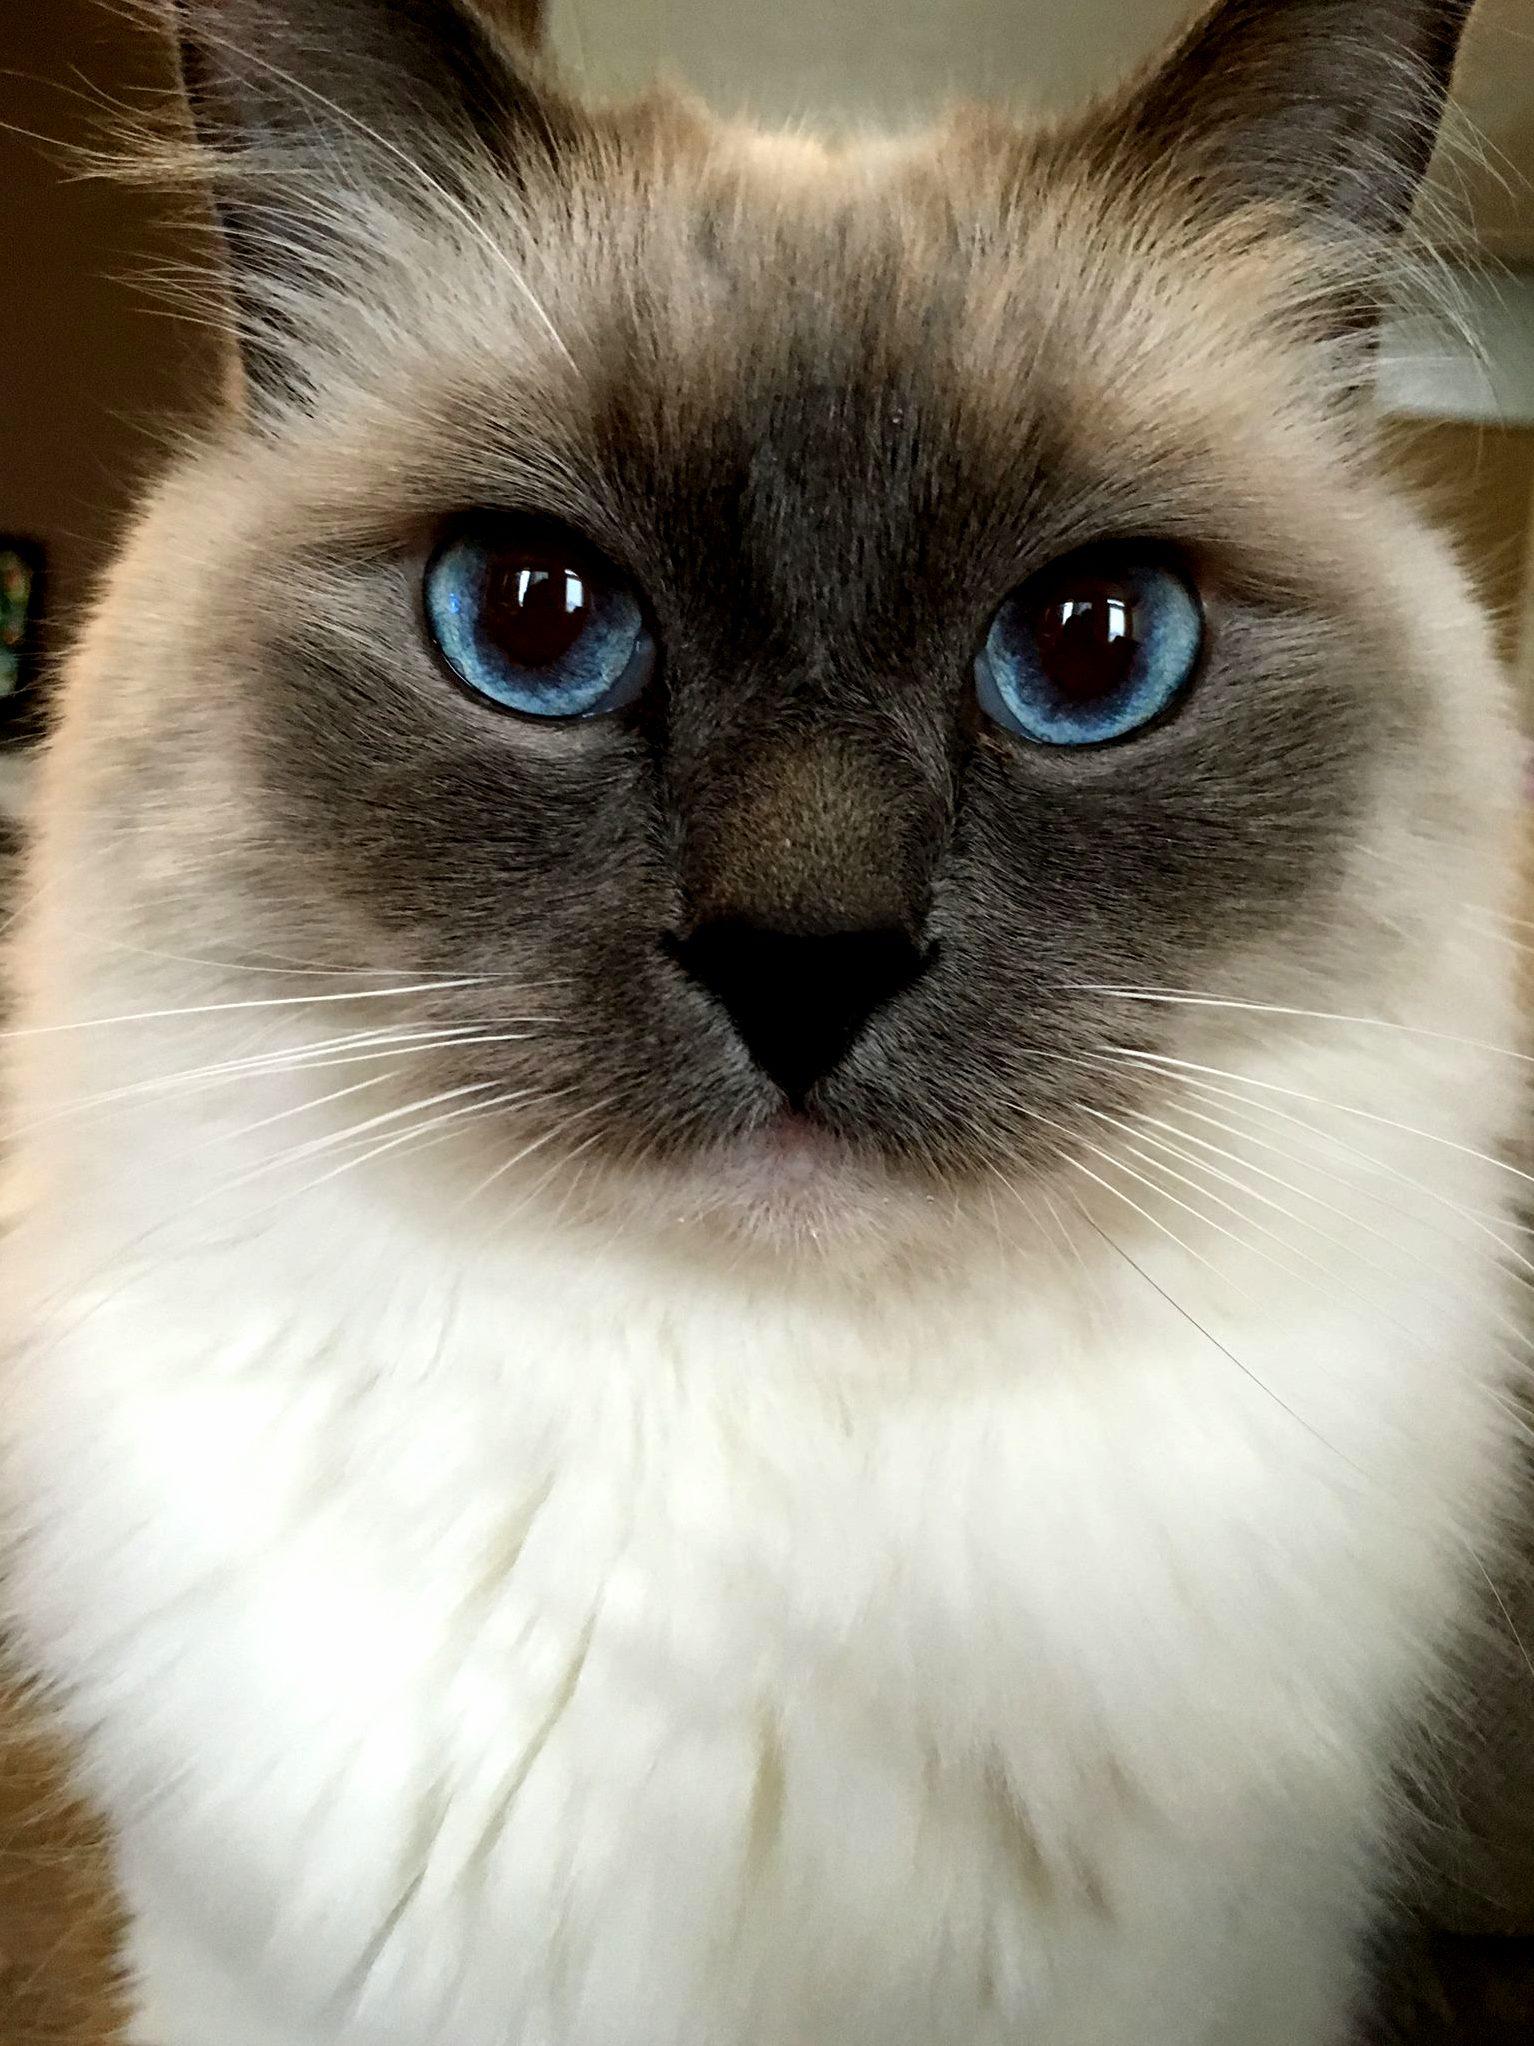 My yoshi showing off his pretty blue eyes